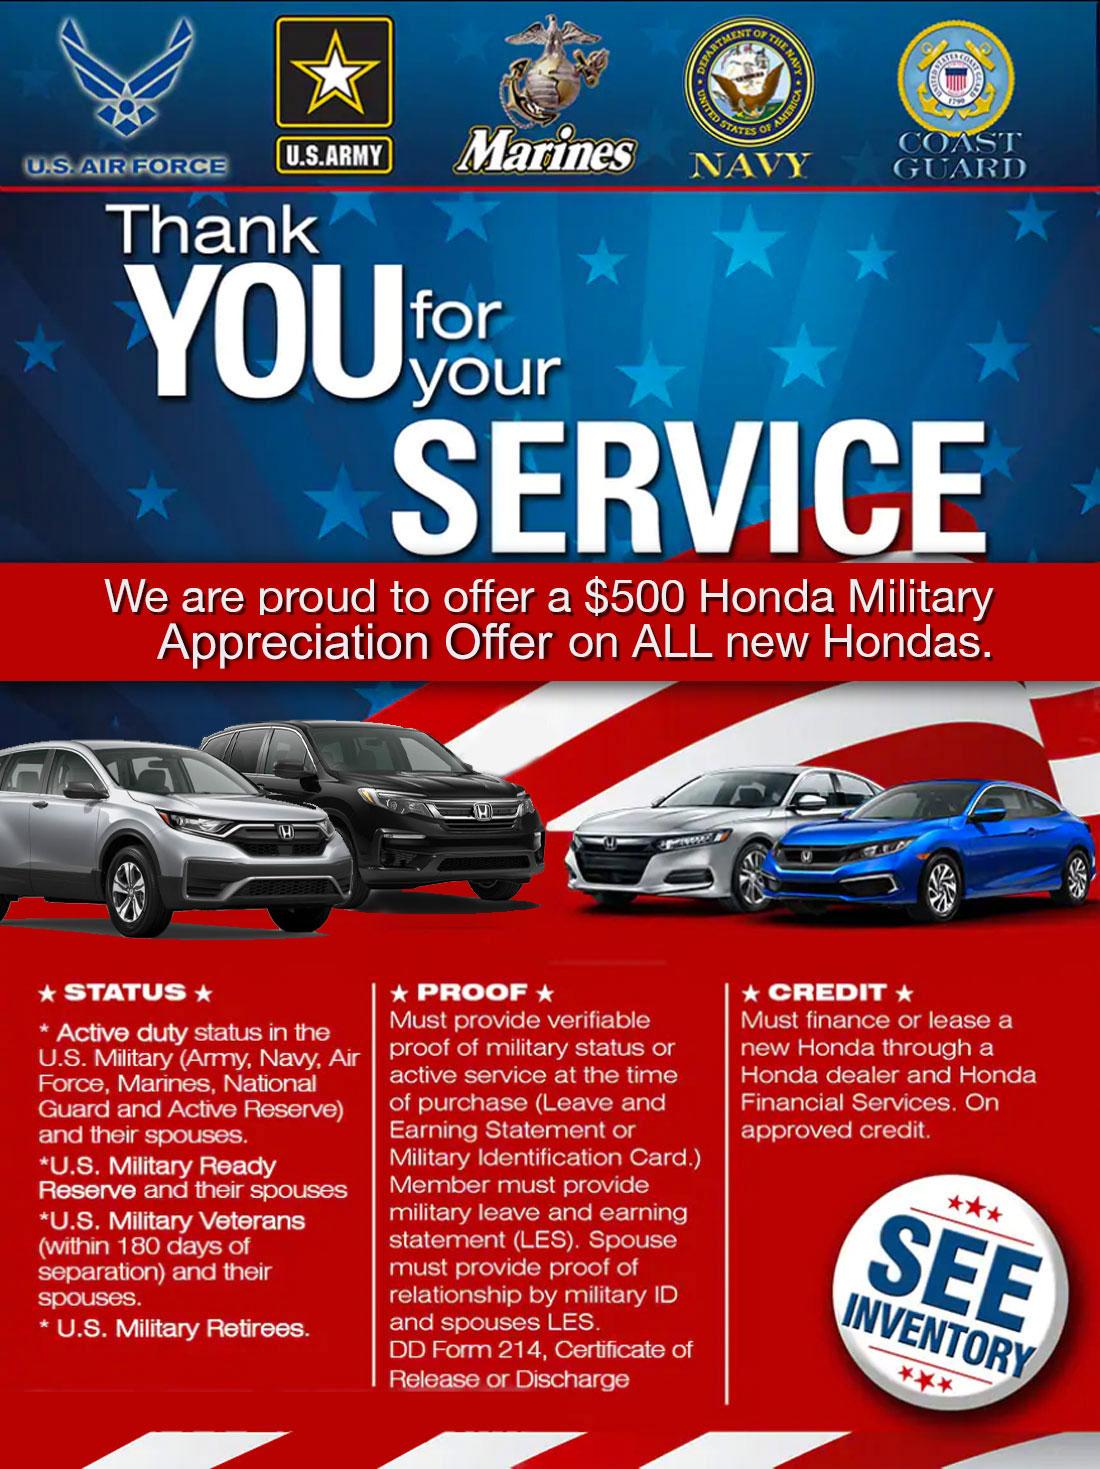 Military Appreciation Program in New Orleans, Louisiana